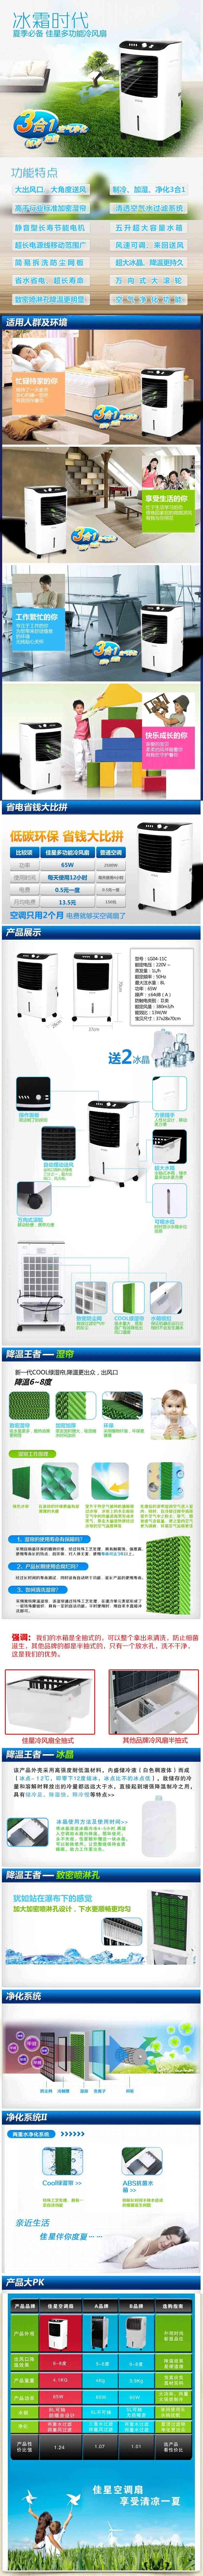 jasun 佳星 空调扇 lg04-11c 冷风扇 冷风机 加湿净化